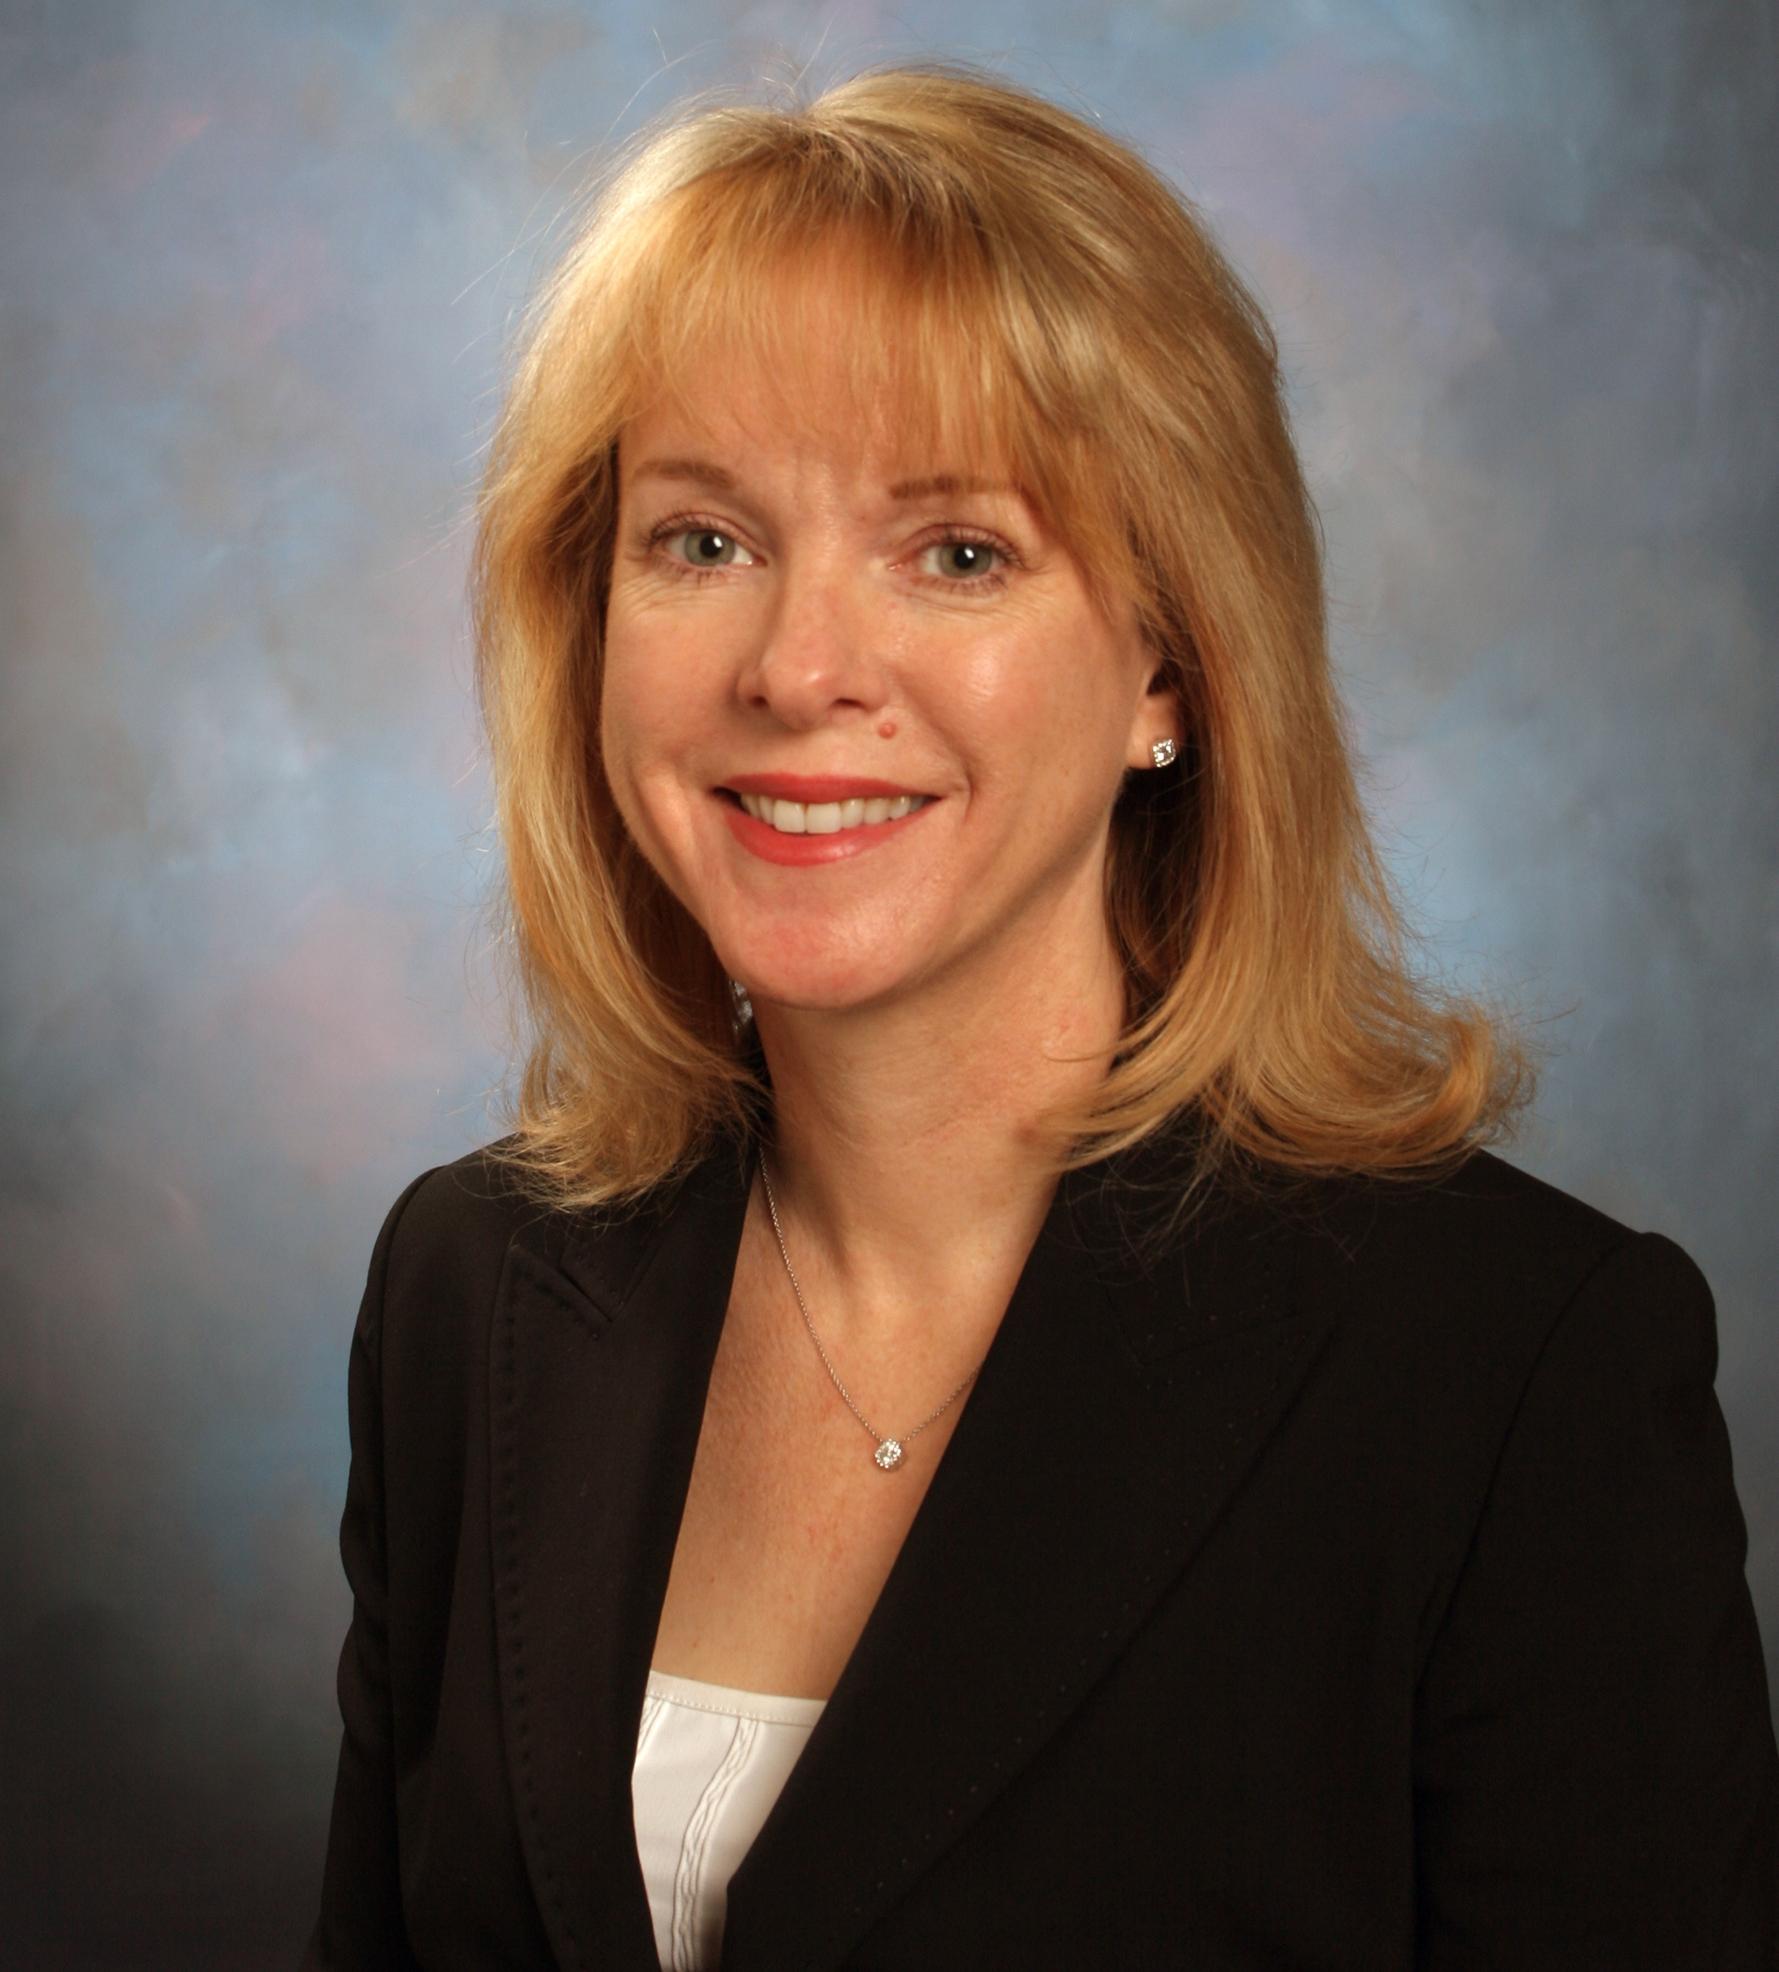 Megan Scott-Kakures | Retired Corporate Executive and Lawyer